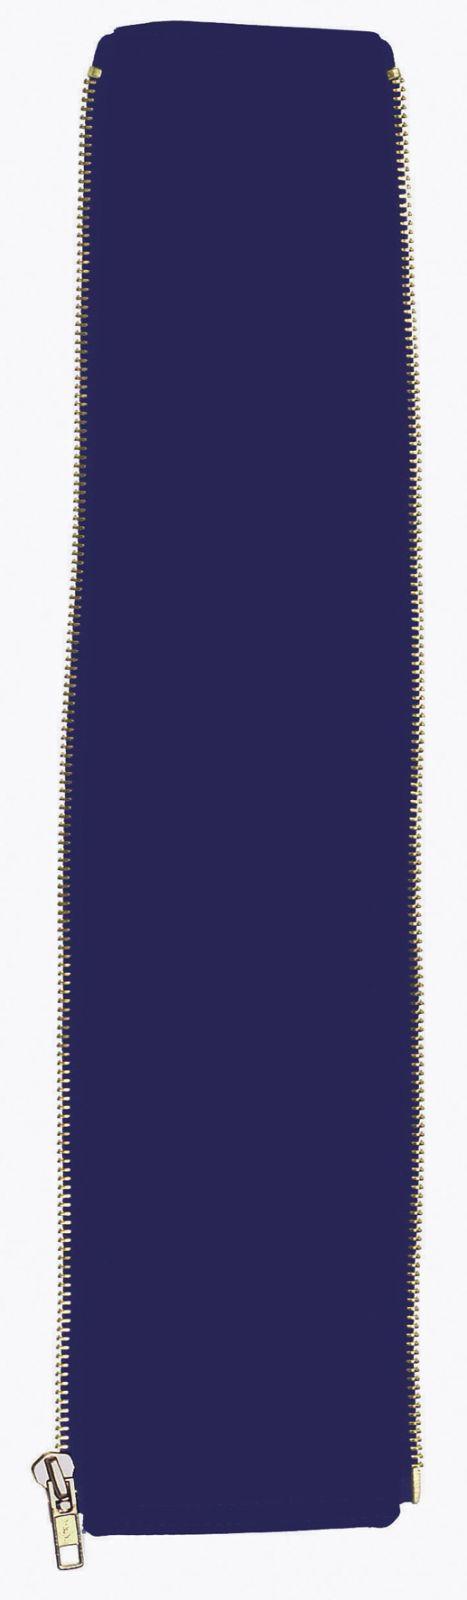 Blaklader Inzetstukken 21291860 Maatverbreder marineblauw(8900)